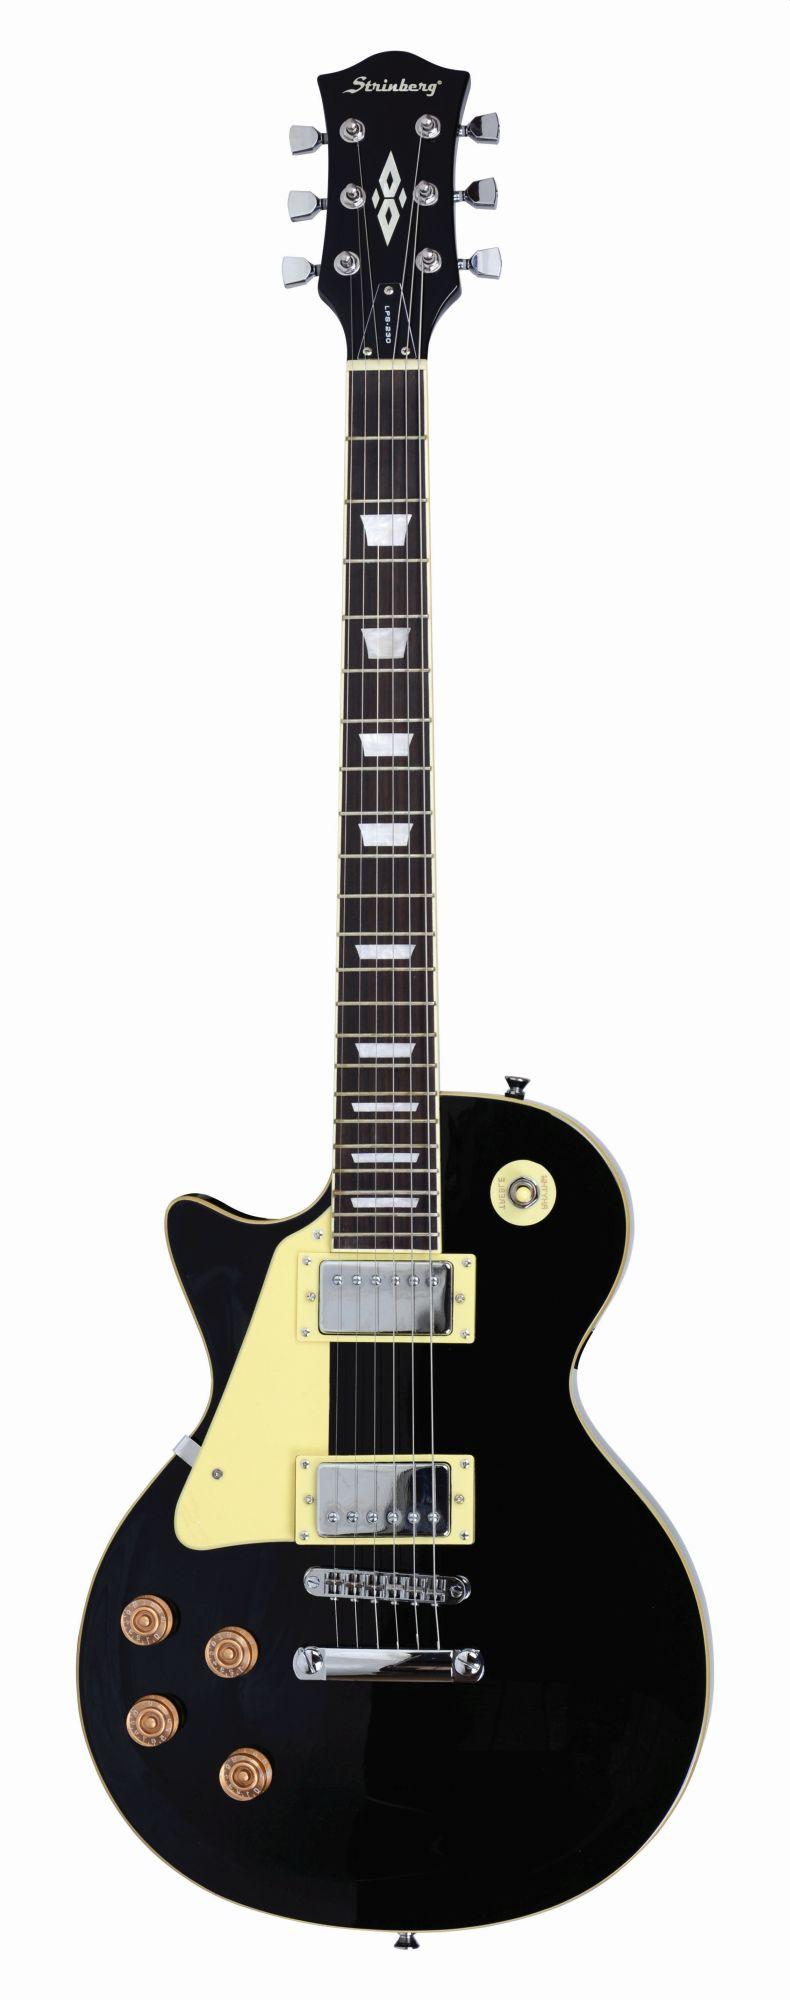 Guitarra Strinberg Lps230 Bk Canhoto